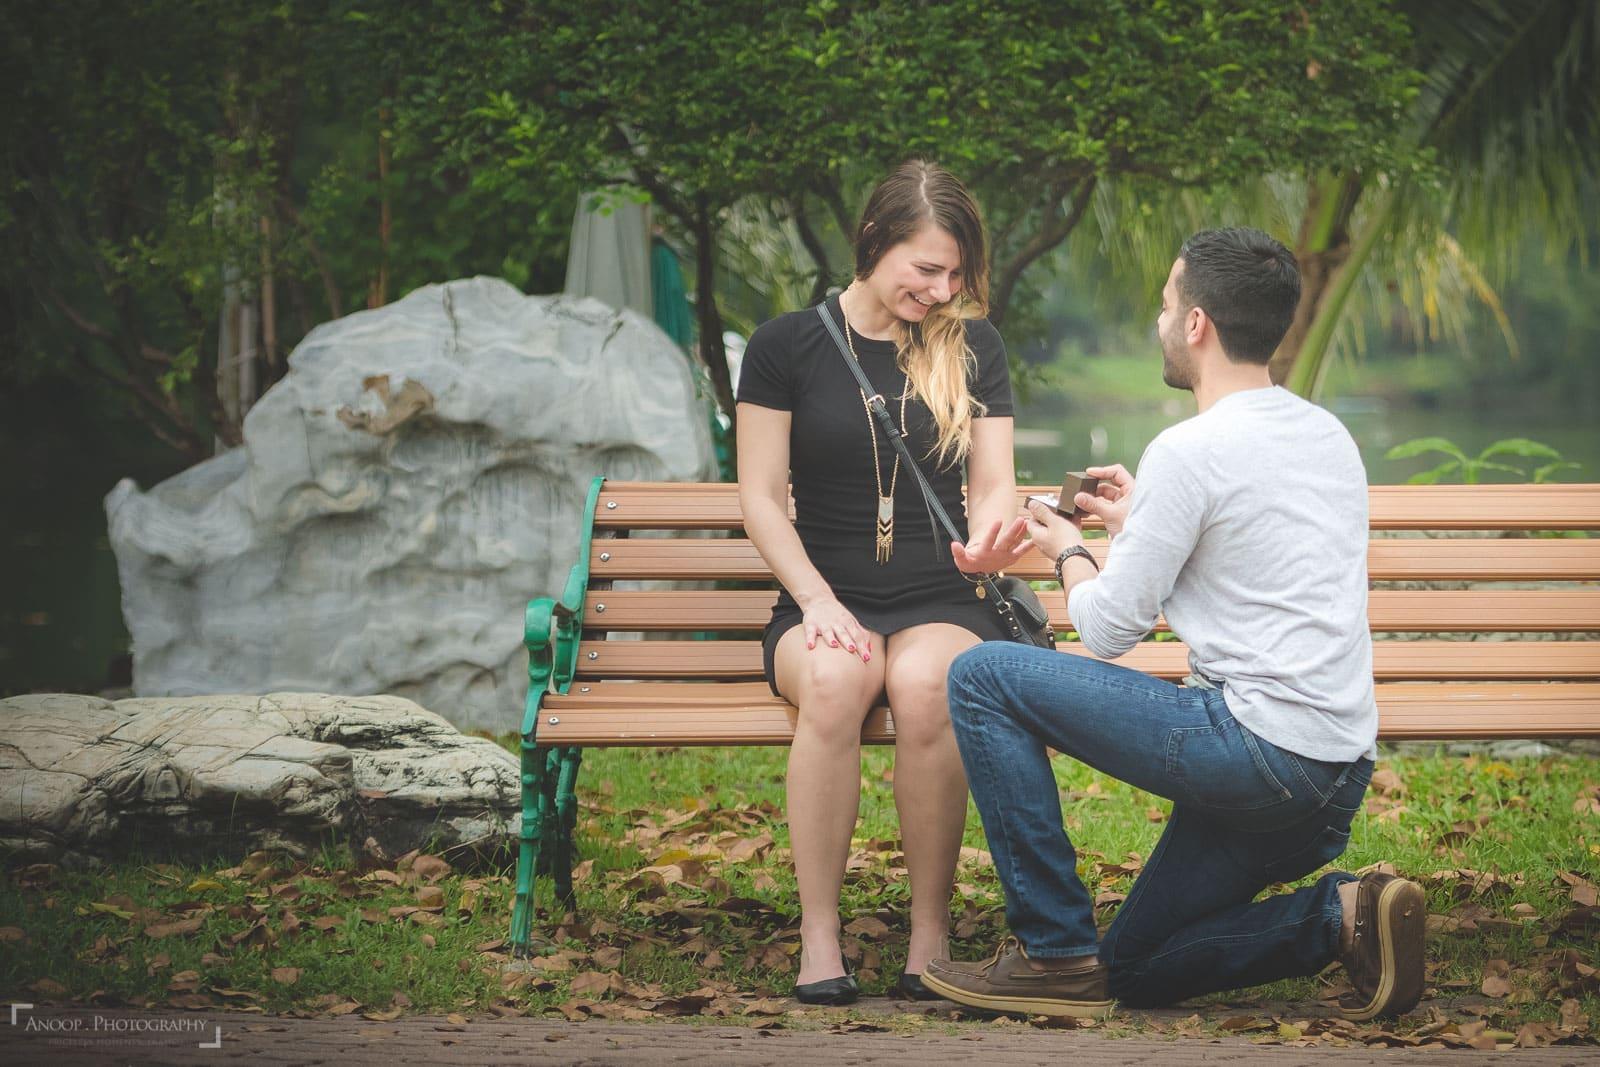 surprise-proposal-photography-thailand-marriage-proposal-ideas-photos12